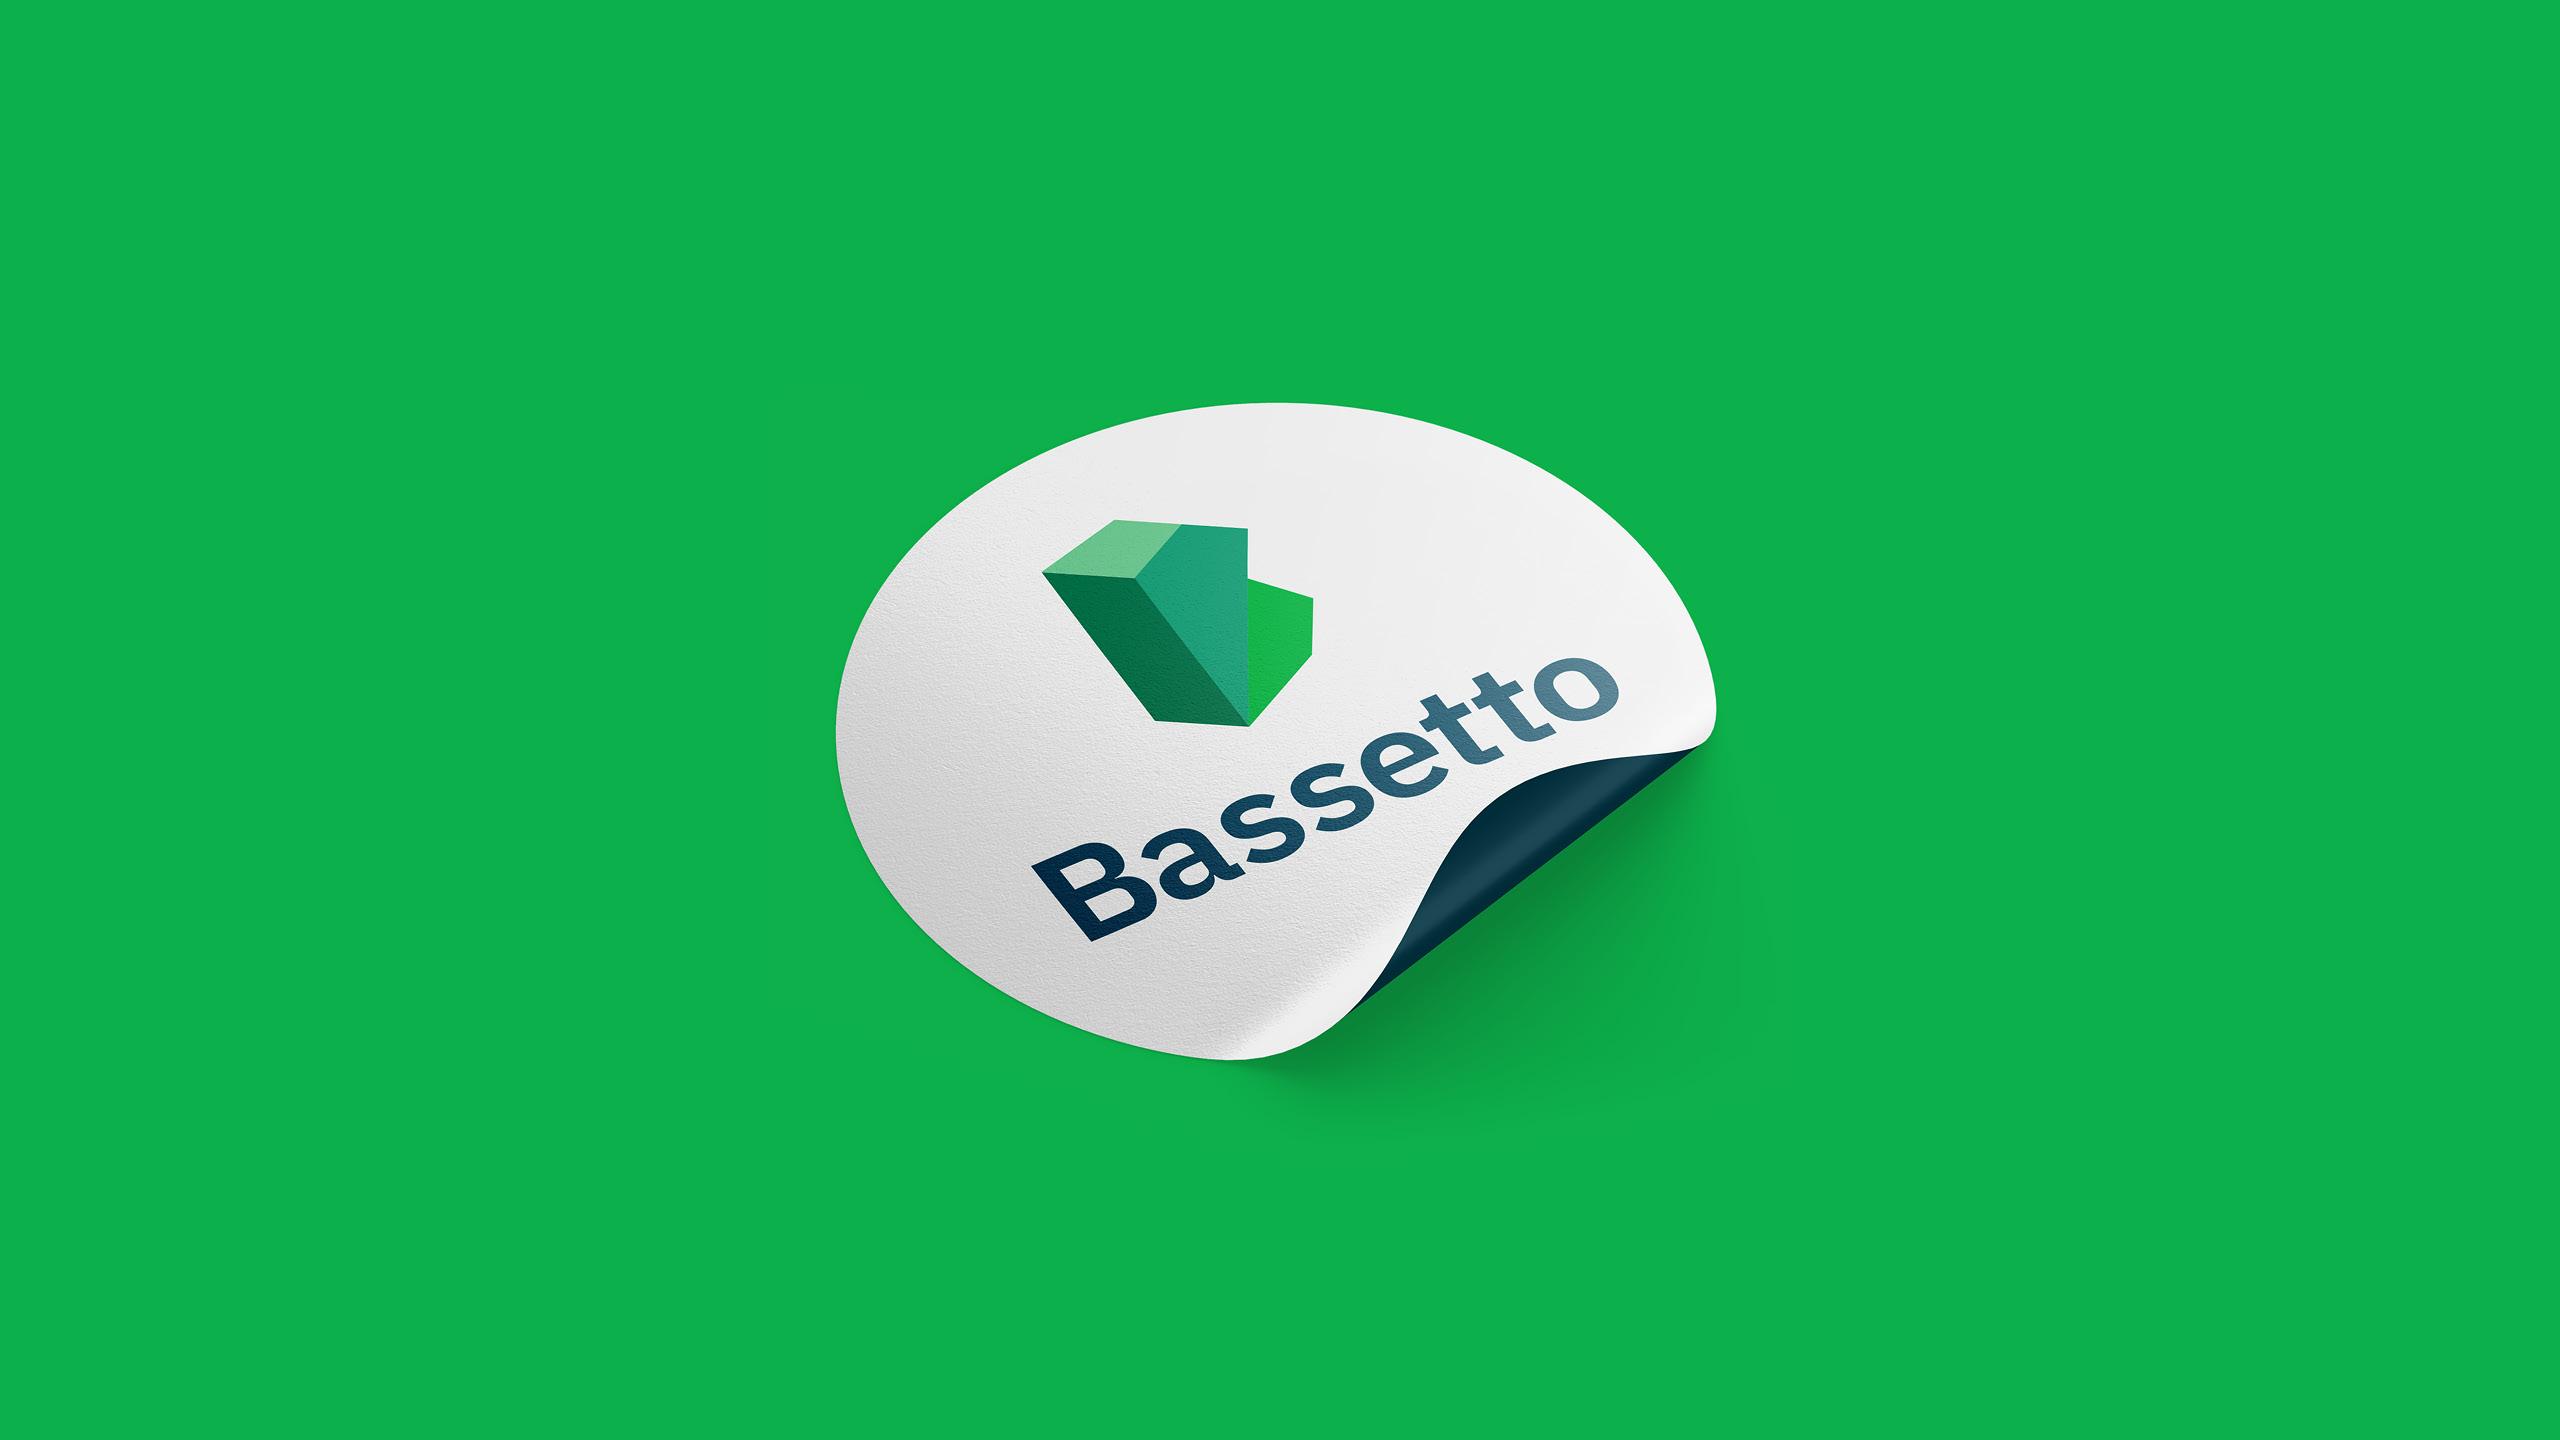 Portfolio_Bassetto_9